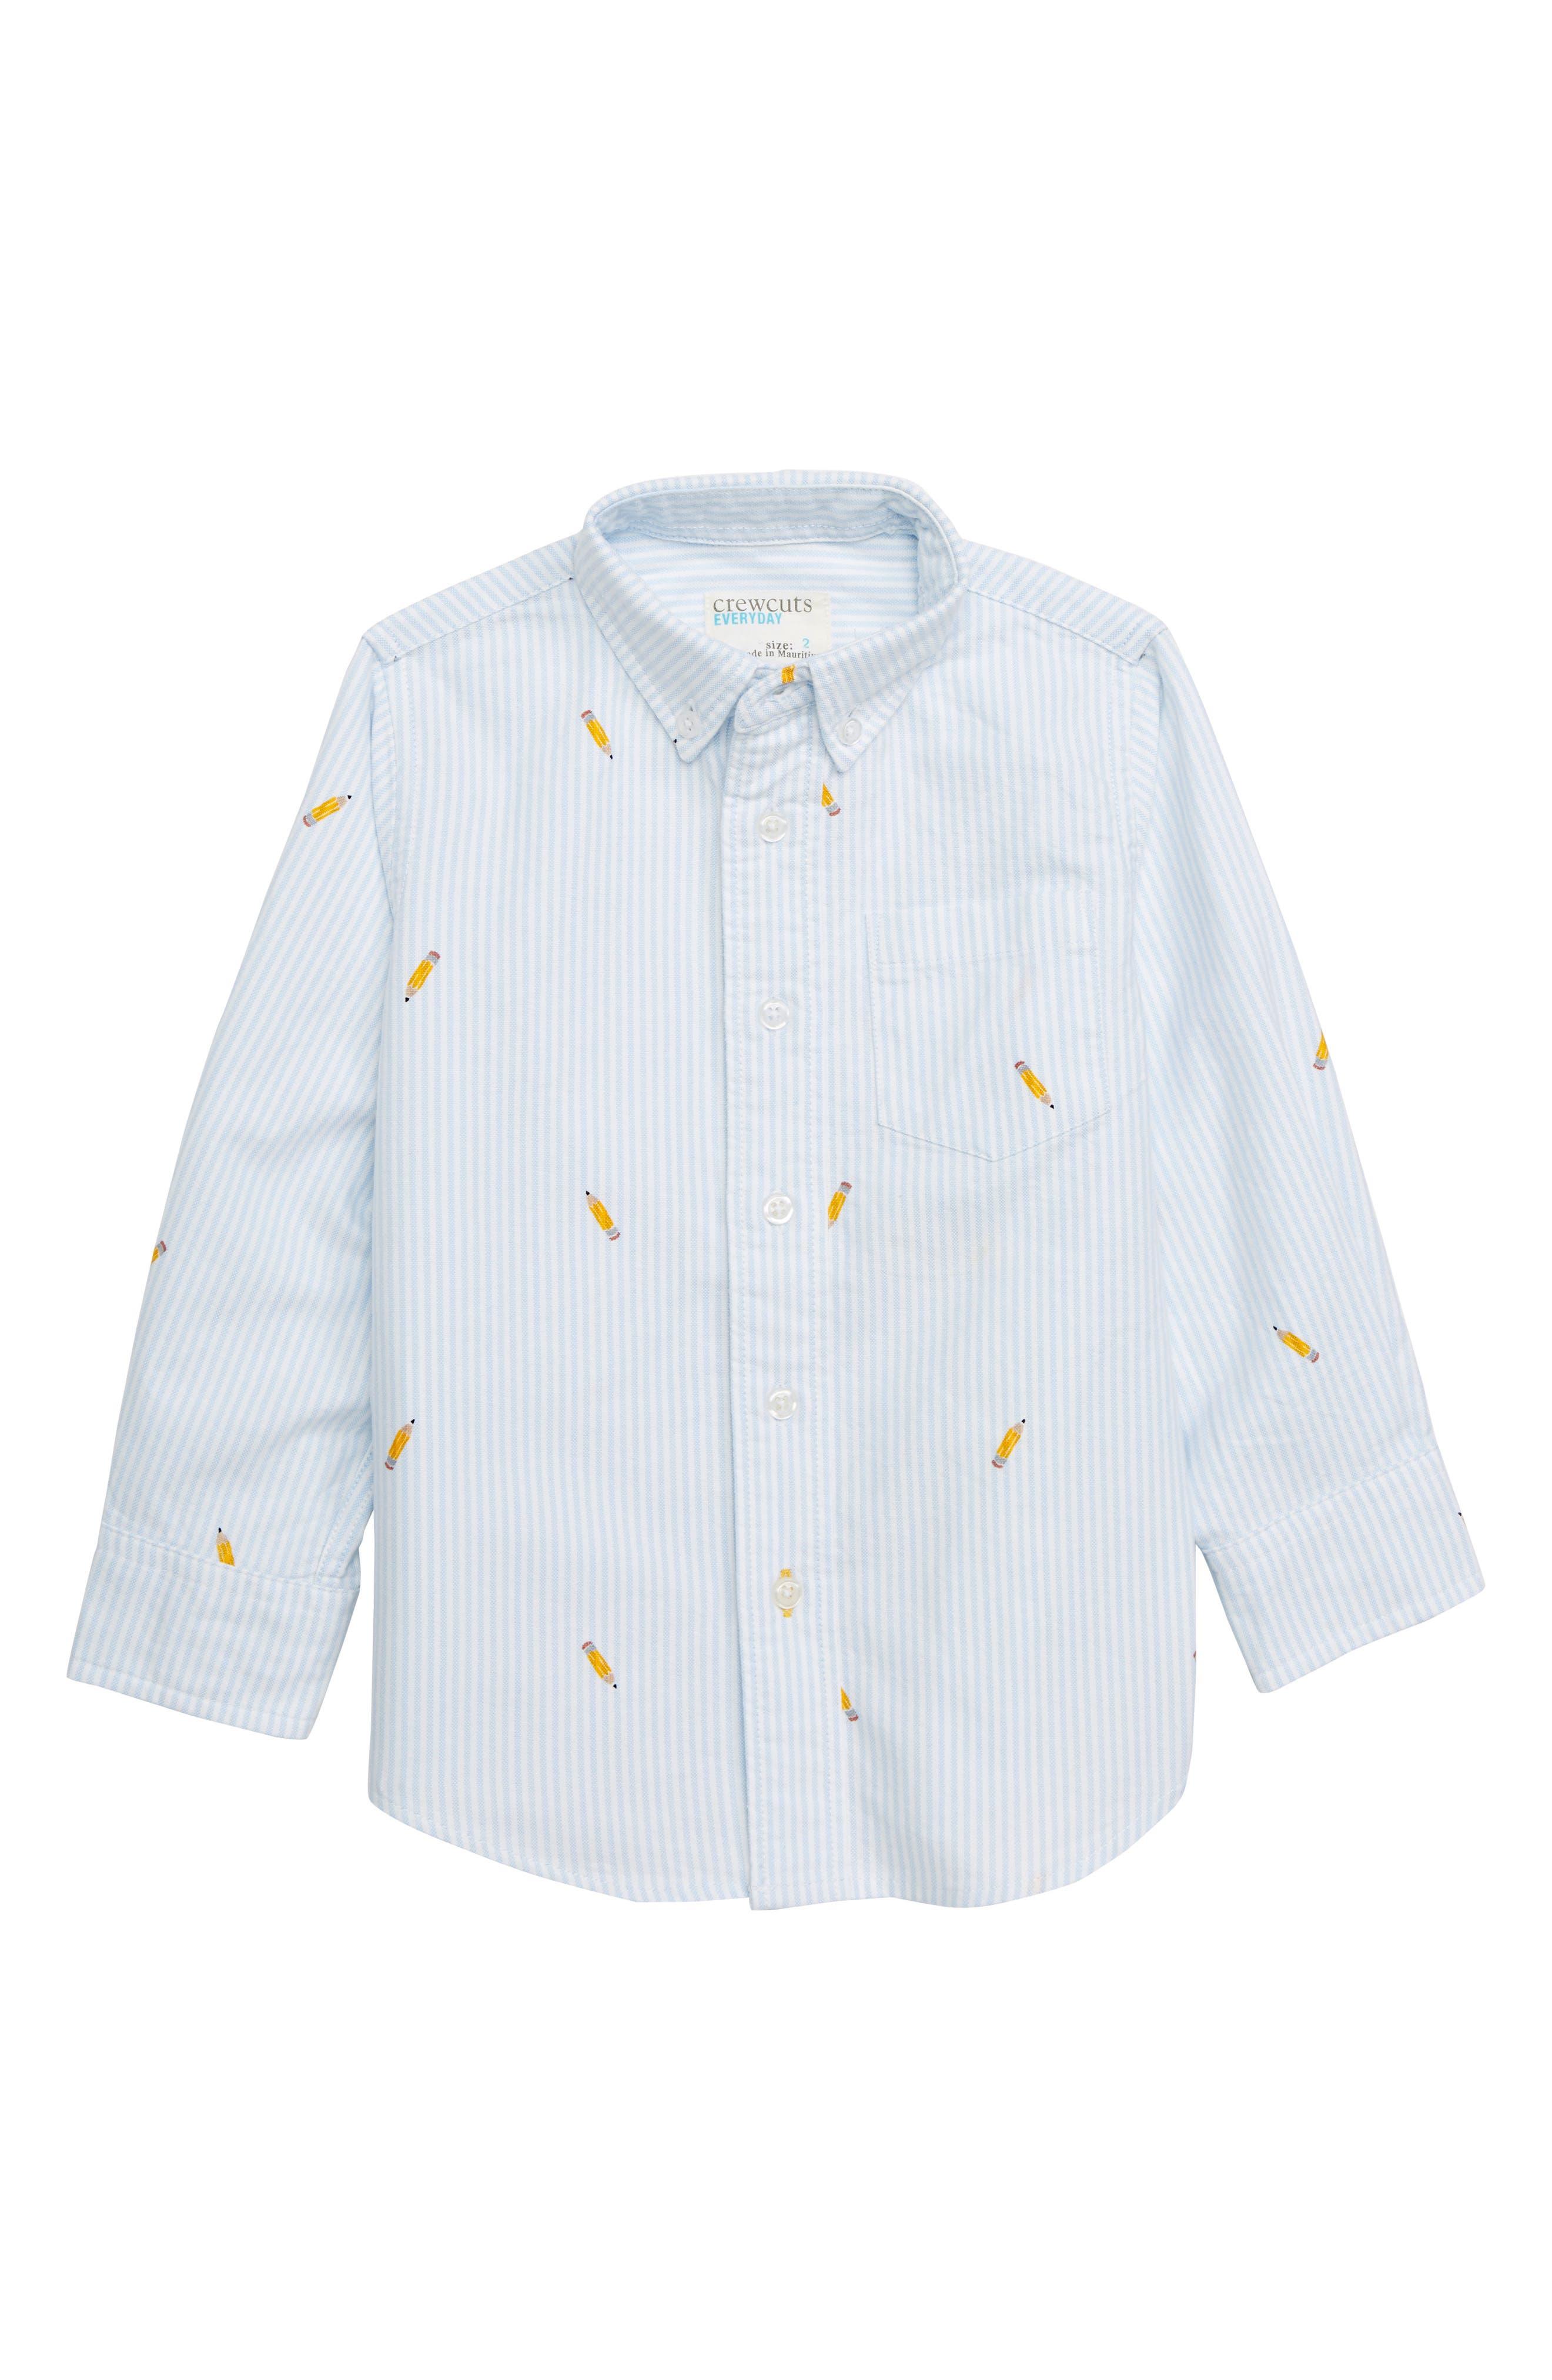 Critter Oxford Shirt,                             Main thumbnail 1, color,                             BLUE MULTI